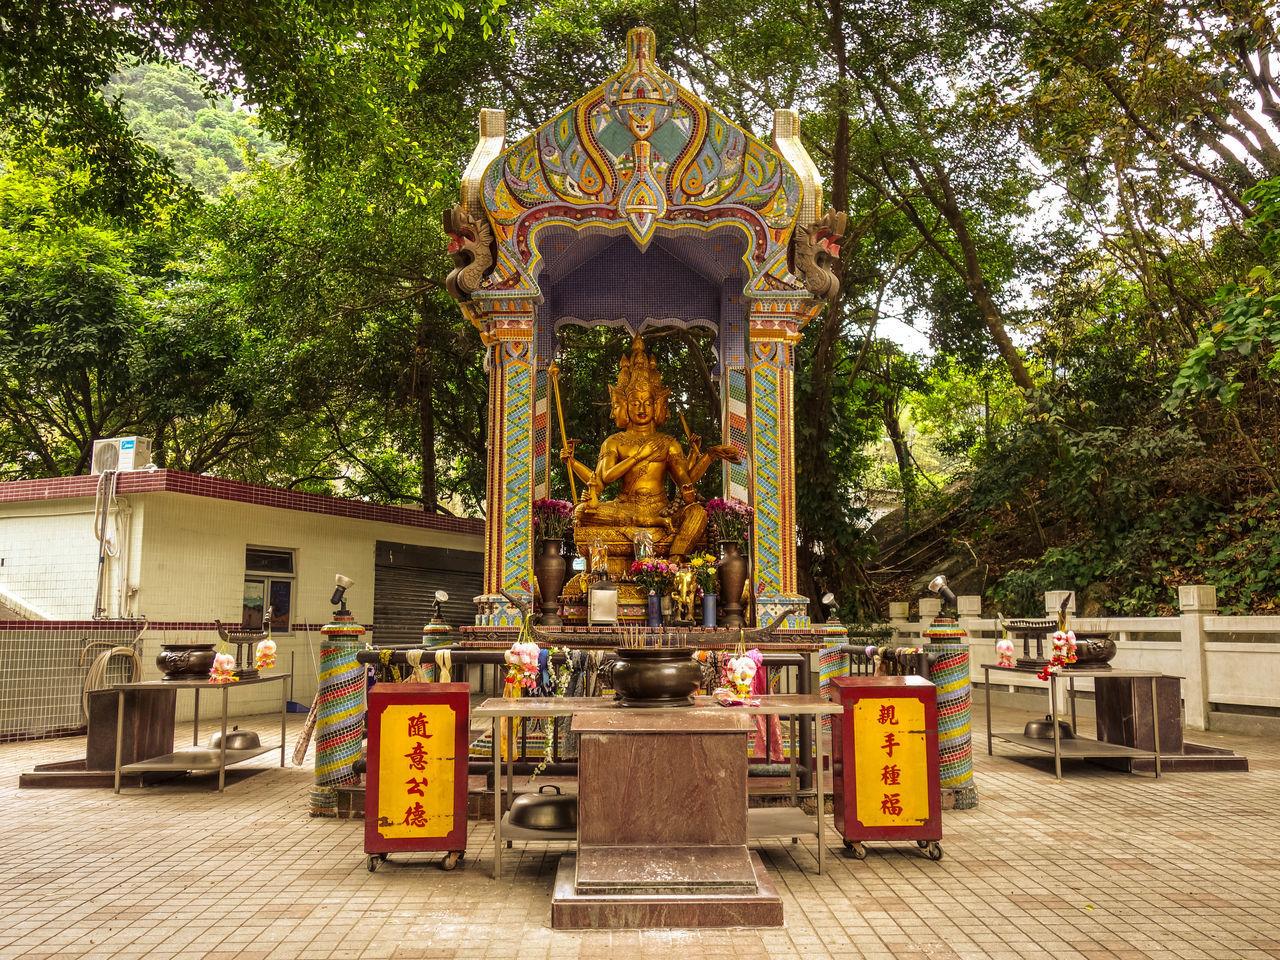 Chinese Monastery Hong Kong Shatin Tai Wai Budhism Budhist Architecture Temple Budhha Idol Incense Sticks Green Golden Statue